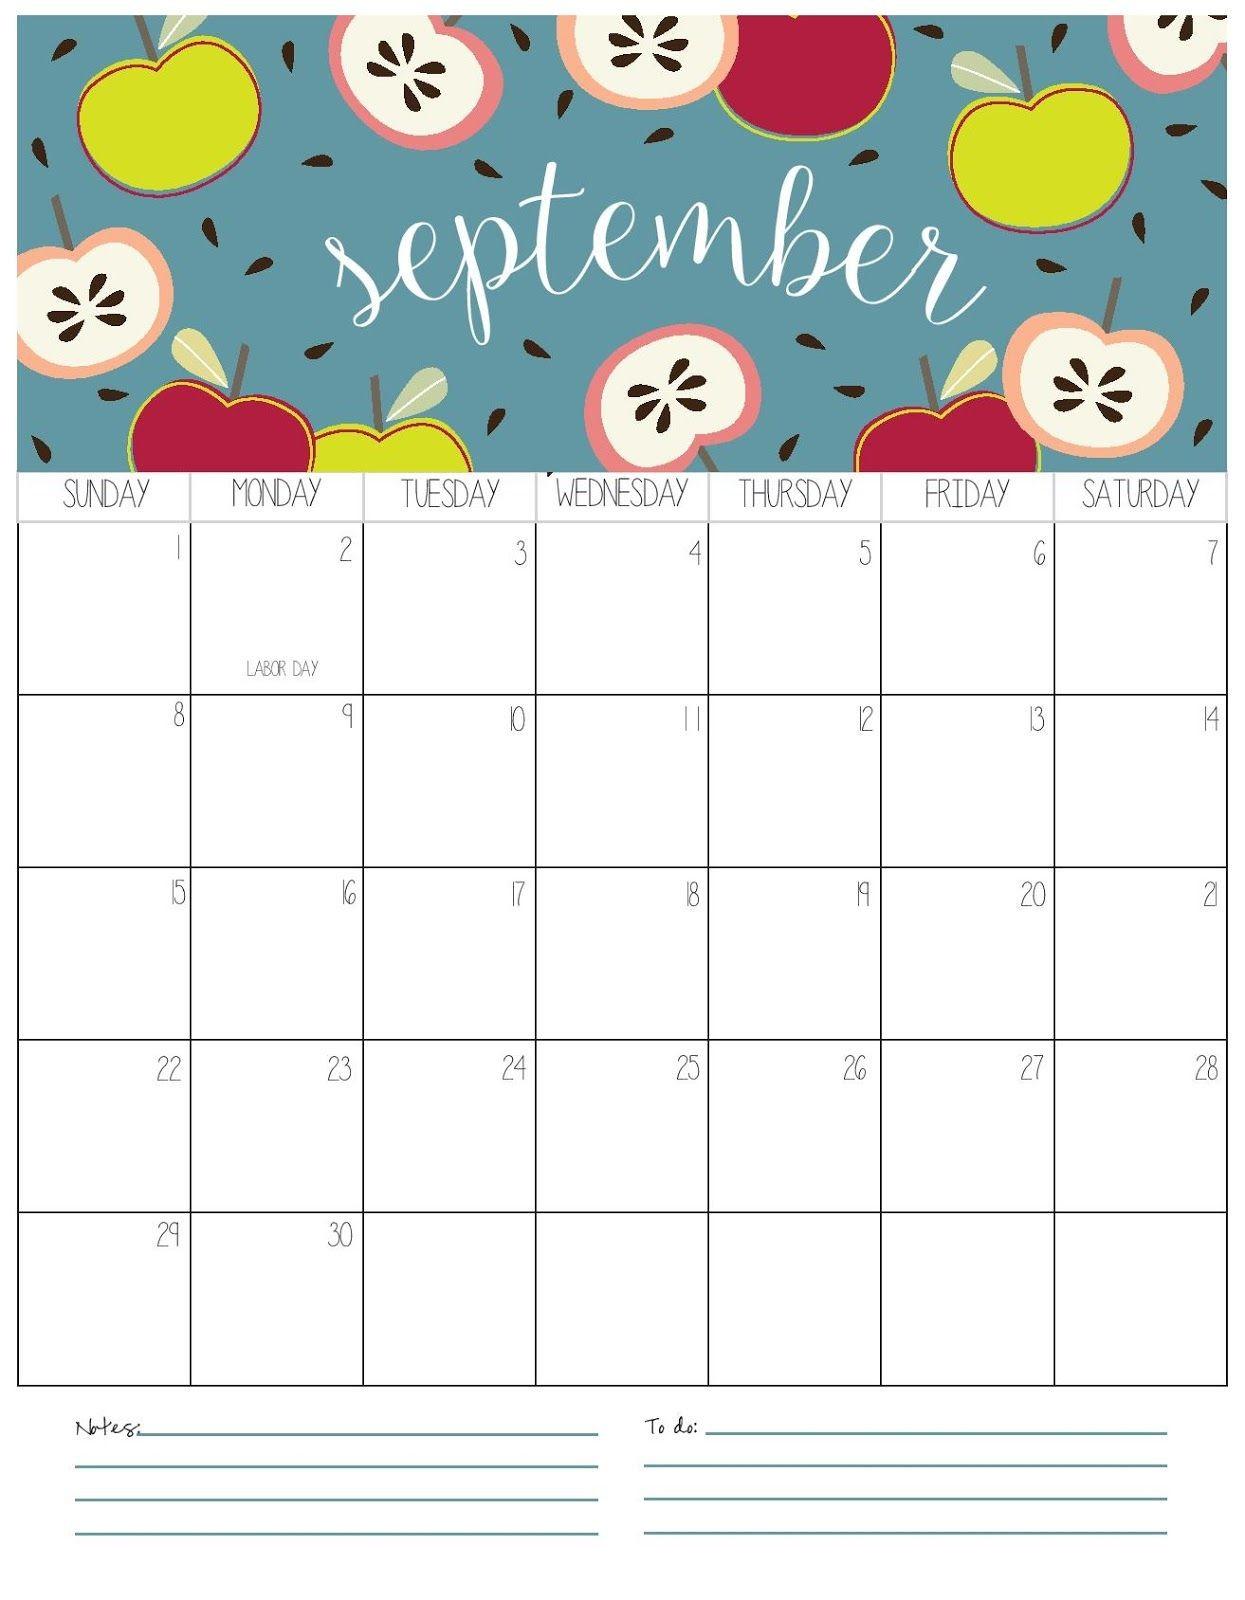 March Calendar Canada Actual Kalender 2019 Zum Ausdrucken Für Kinder Calenders Of March Calendar Canada Más Arriba-a-fecha Kalender Ausdrucken 2015 Schön Printable 0d Calendars Kalender